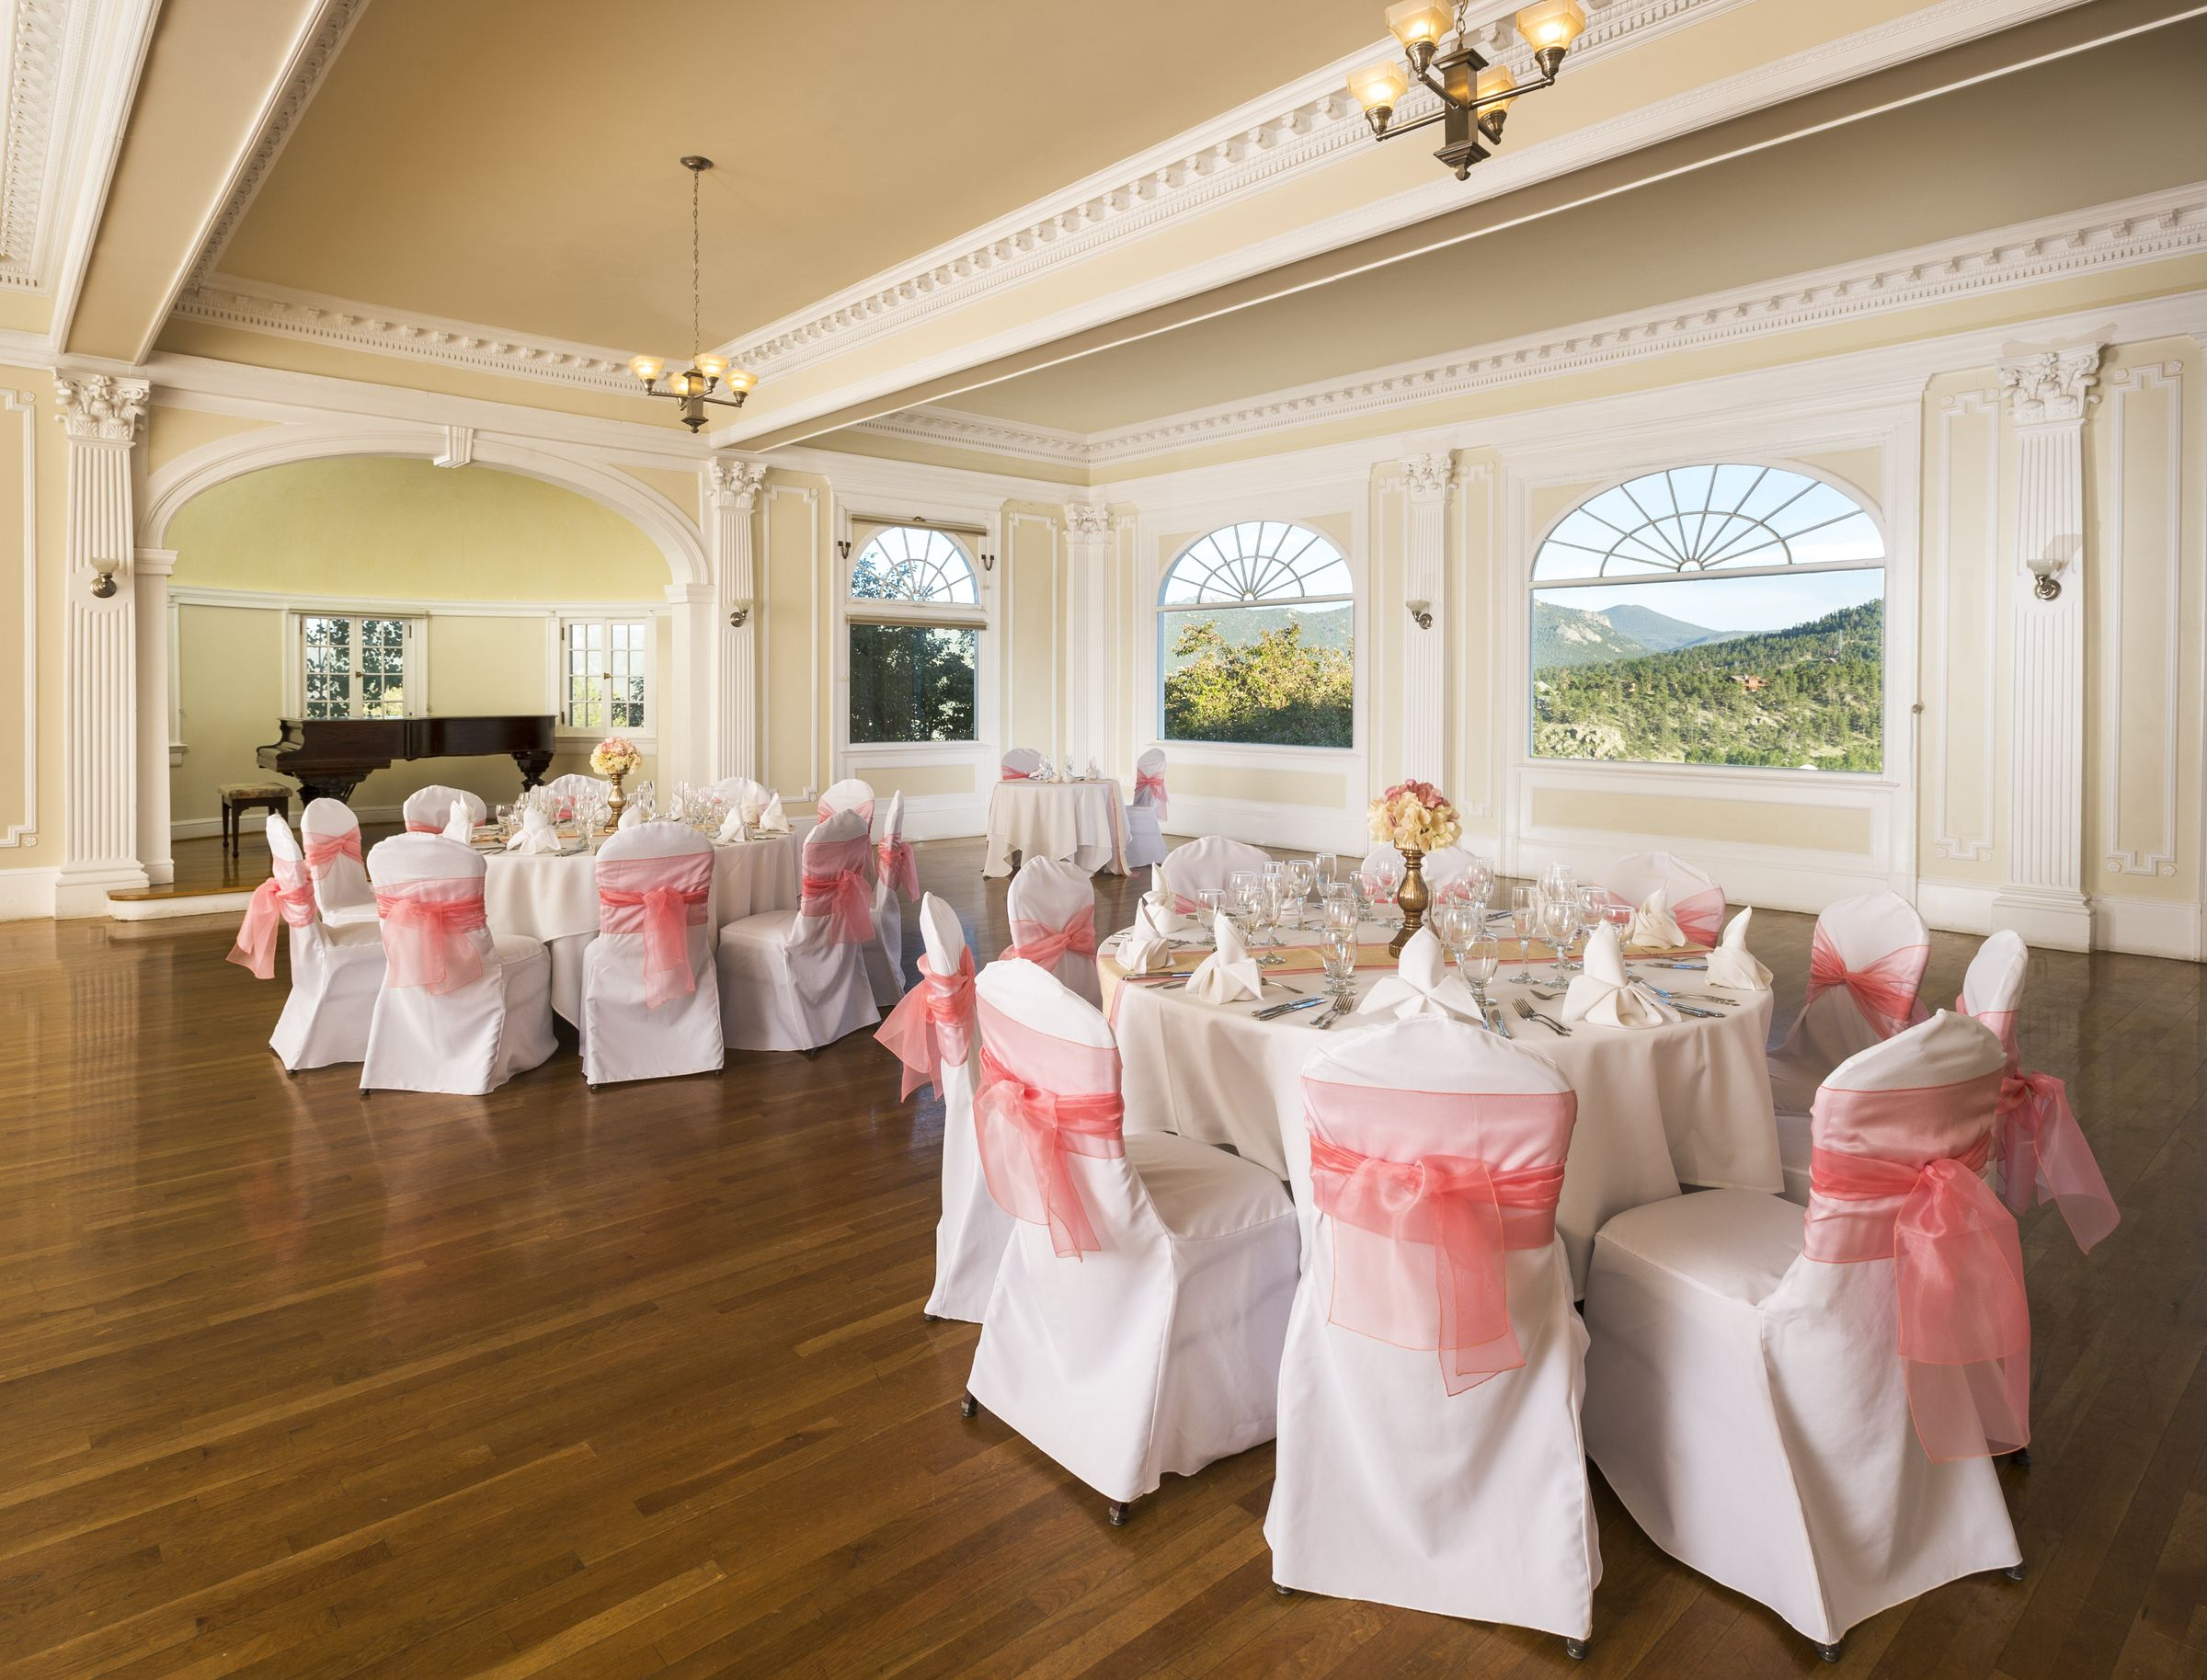 Indoor Wedding Reception Venue - Music Room Stanley